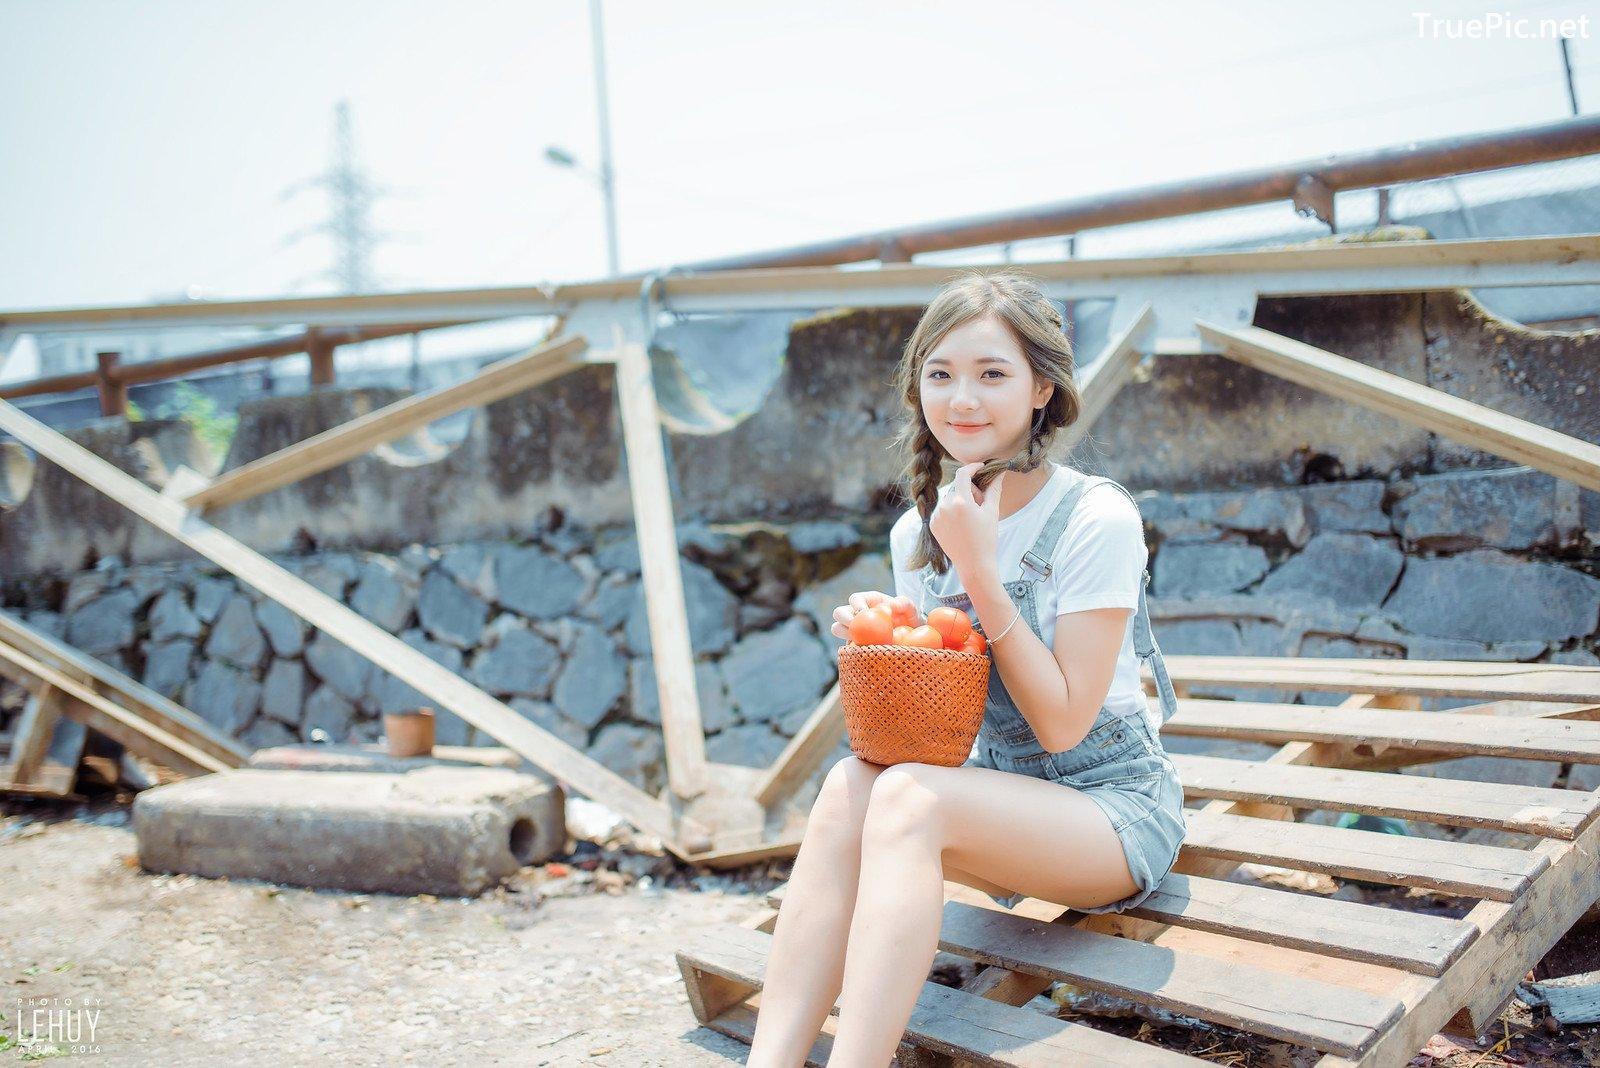 Image-Vietnamese-Hot-Girl-Photo-Album-Tomato-Little-Girl-Cute-TruePic.net- Picture-3